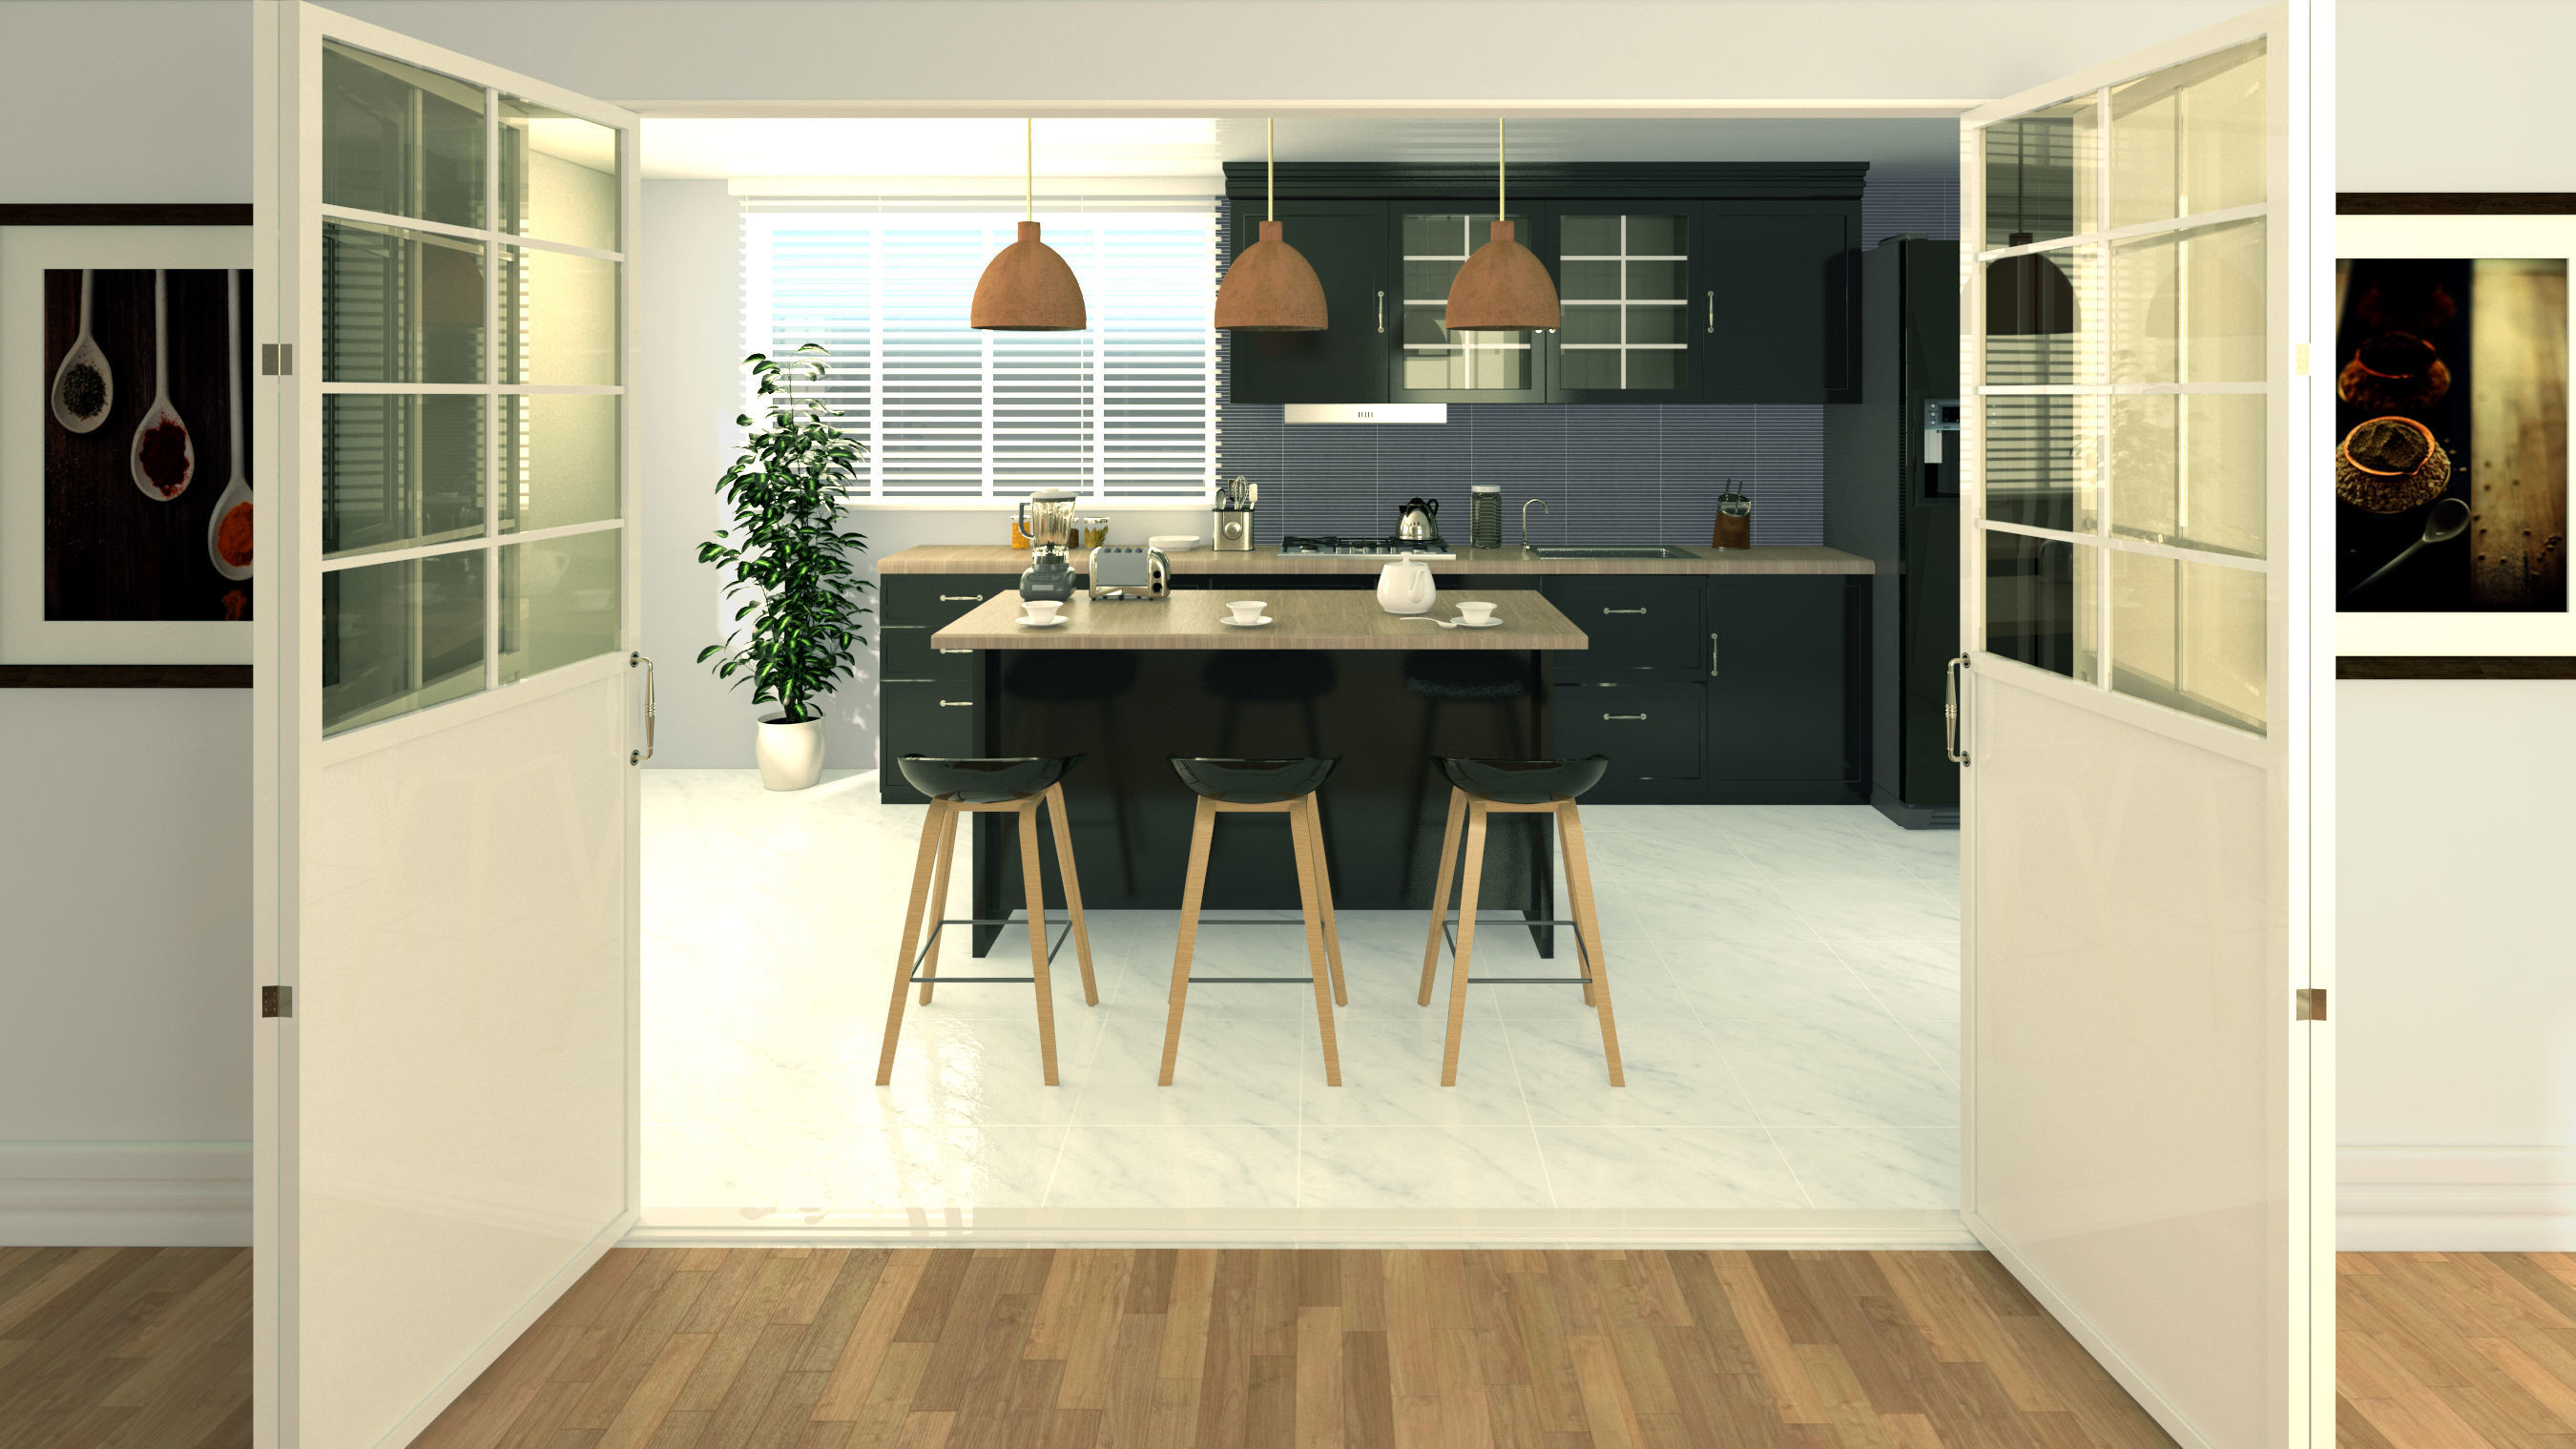 kitchen interior in sketchup   3D model